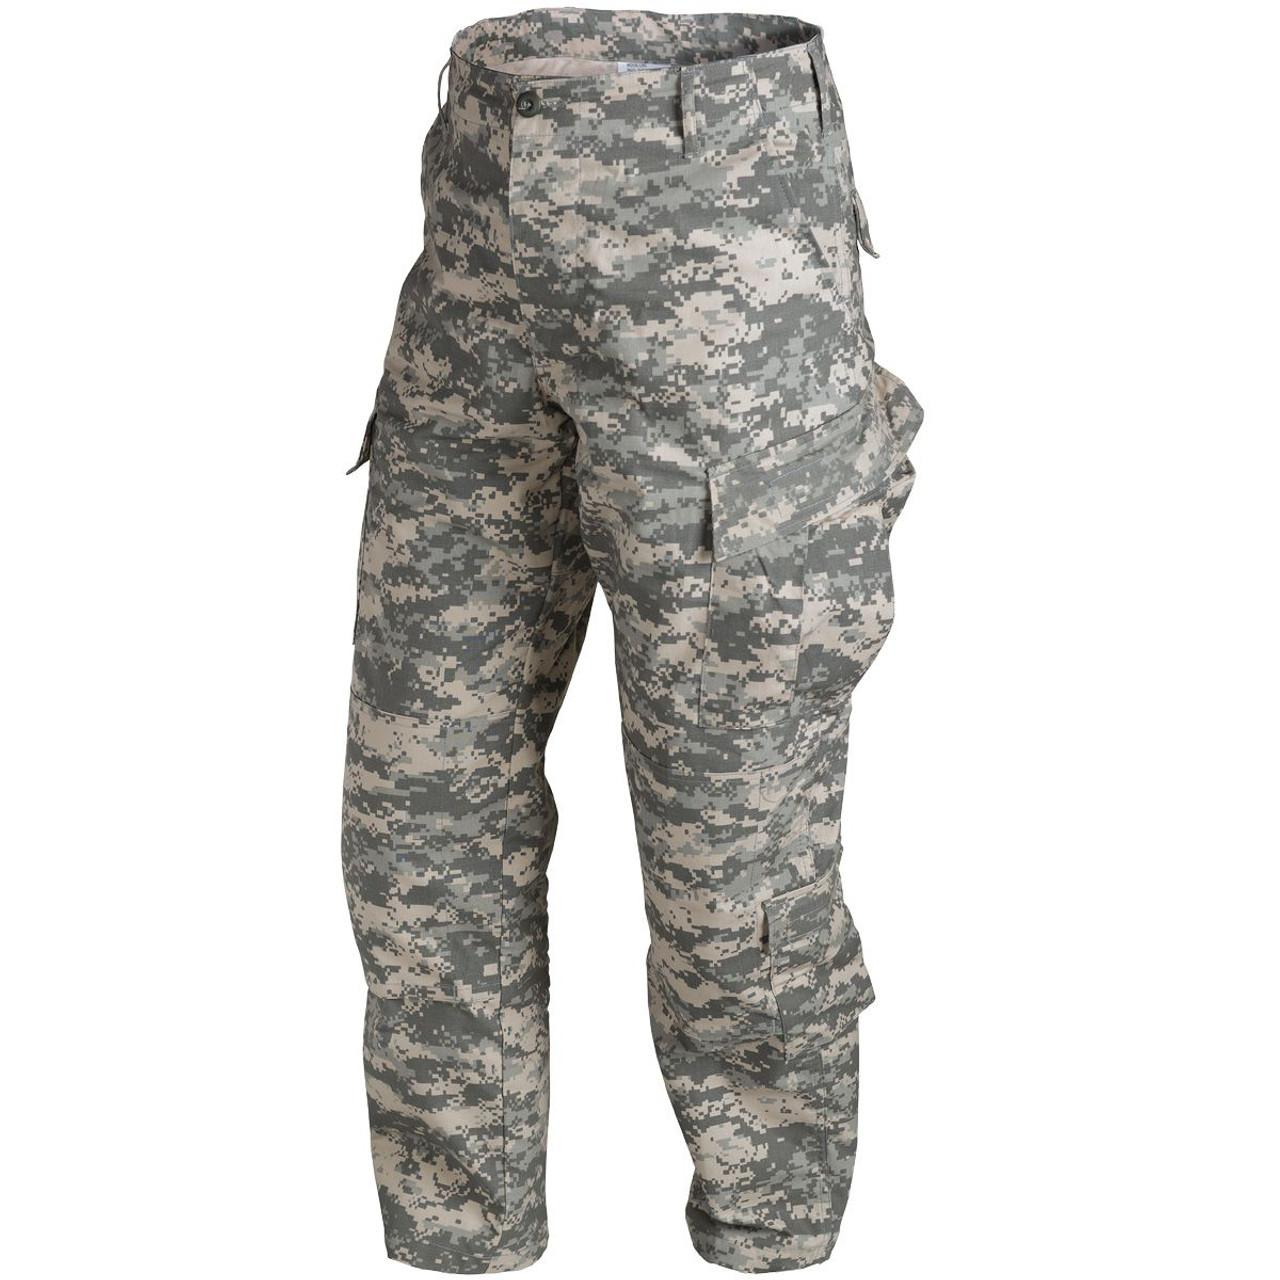 Surplus US ACU Combat Trousers